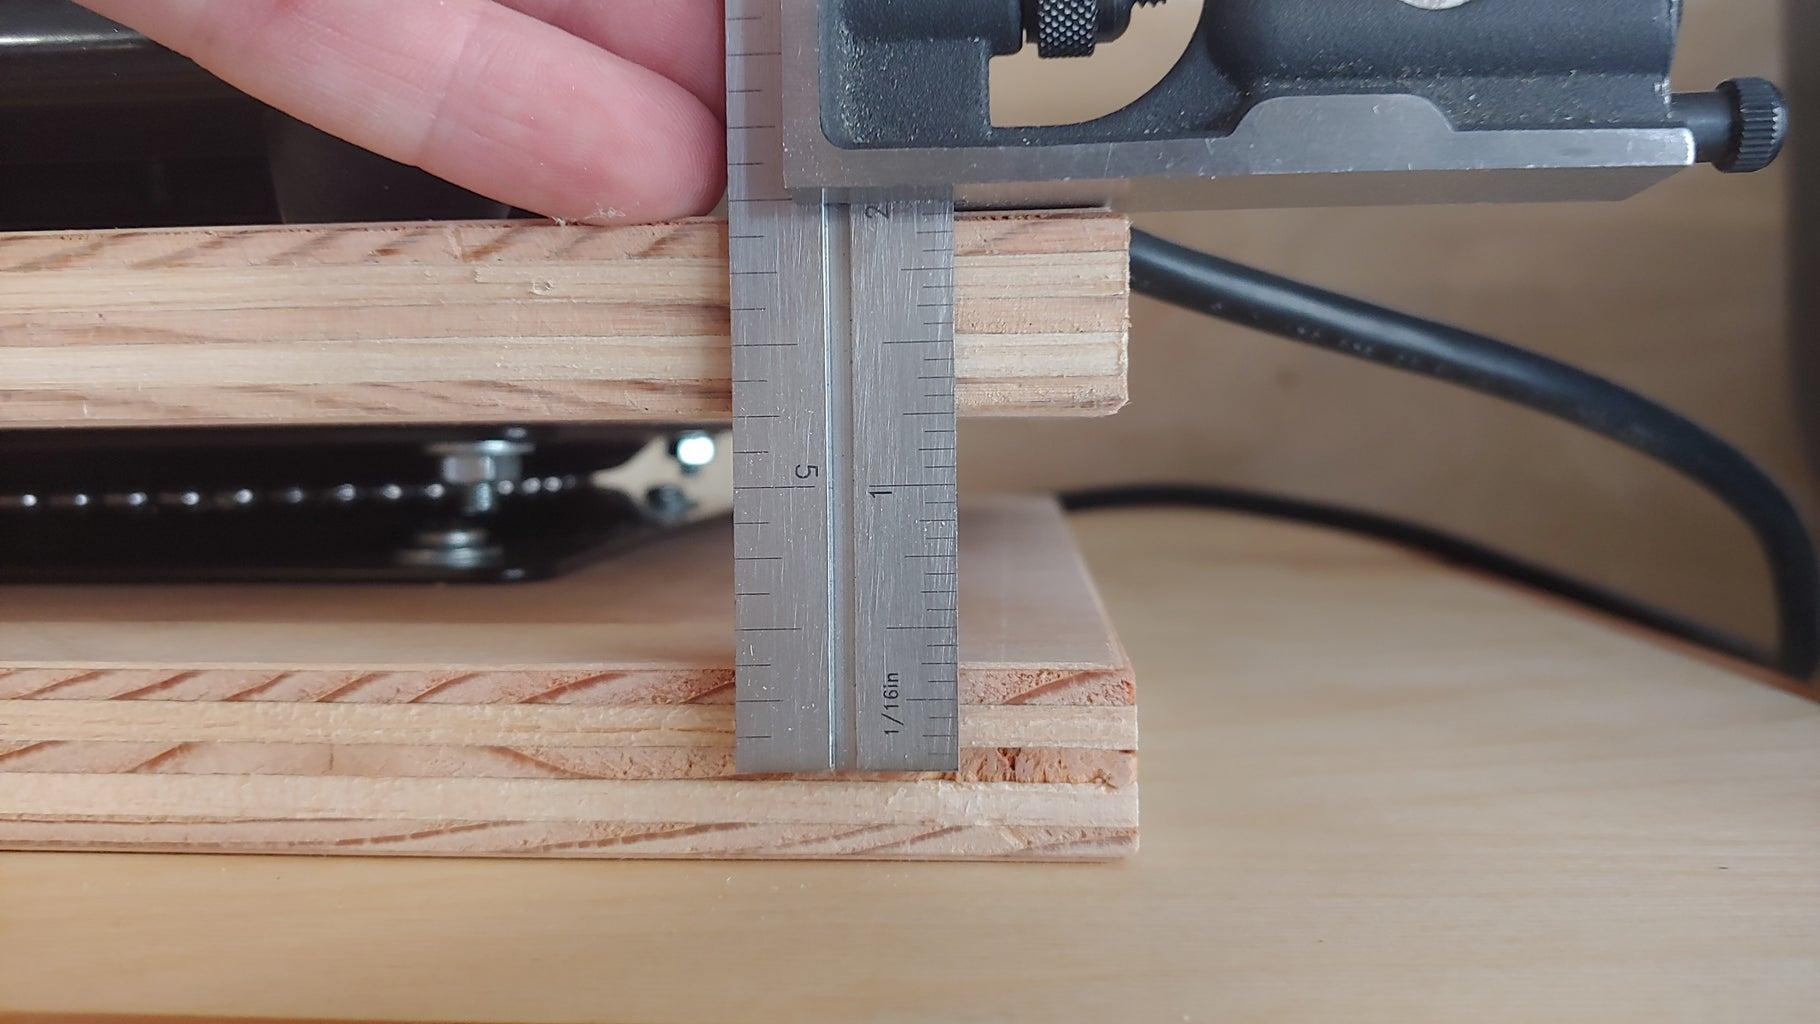 Step 5 (optional) : Make and Mount the Locking Peg